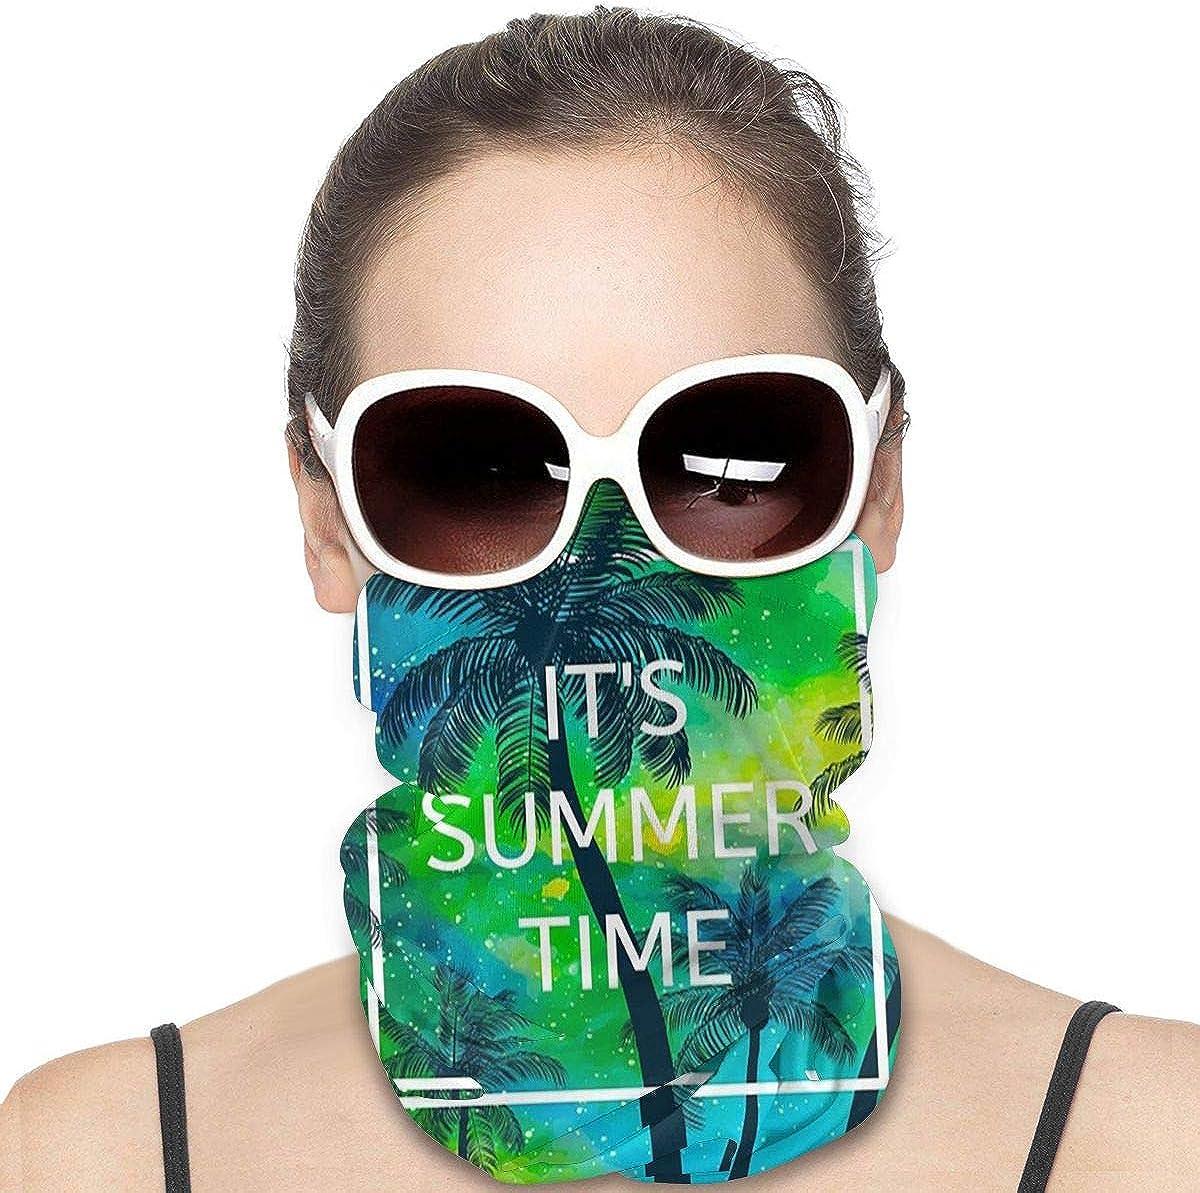 KiuLoam Women Bandanas Face Mask, Hello Summer Time Palm Tree Neck Gaiter Mask Headband for Men Face Scarf Dust, Outdoors, Sports